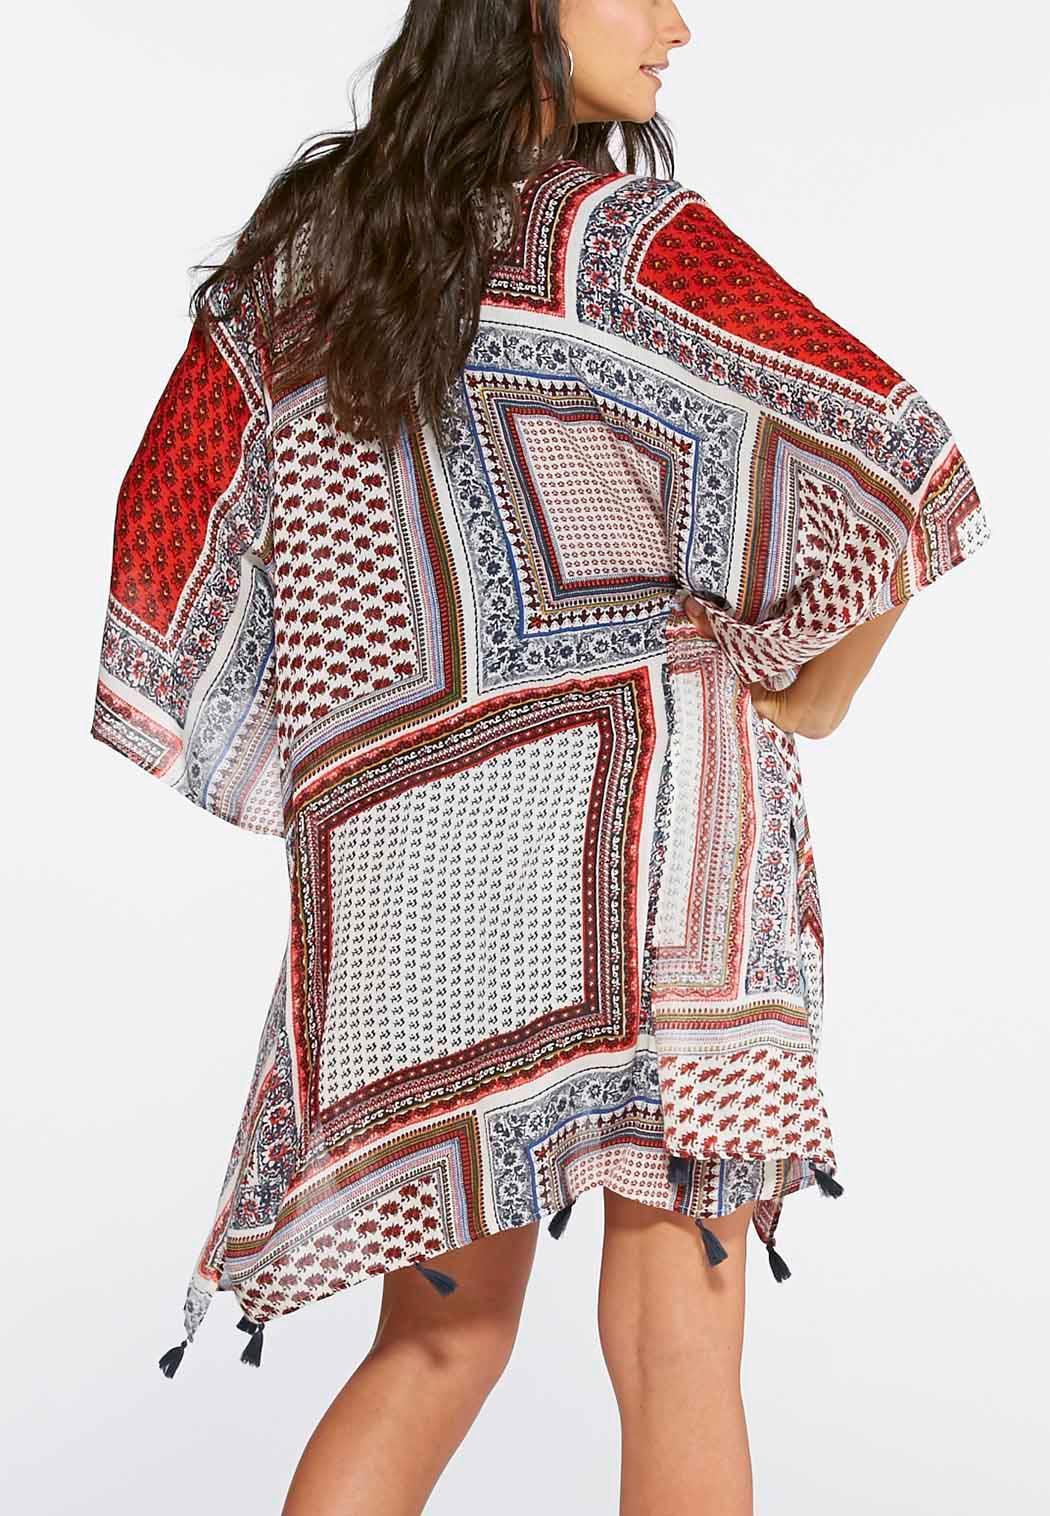 Cato fashions careers - Patchwork Floral Print Kimono